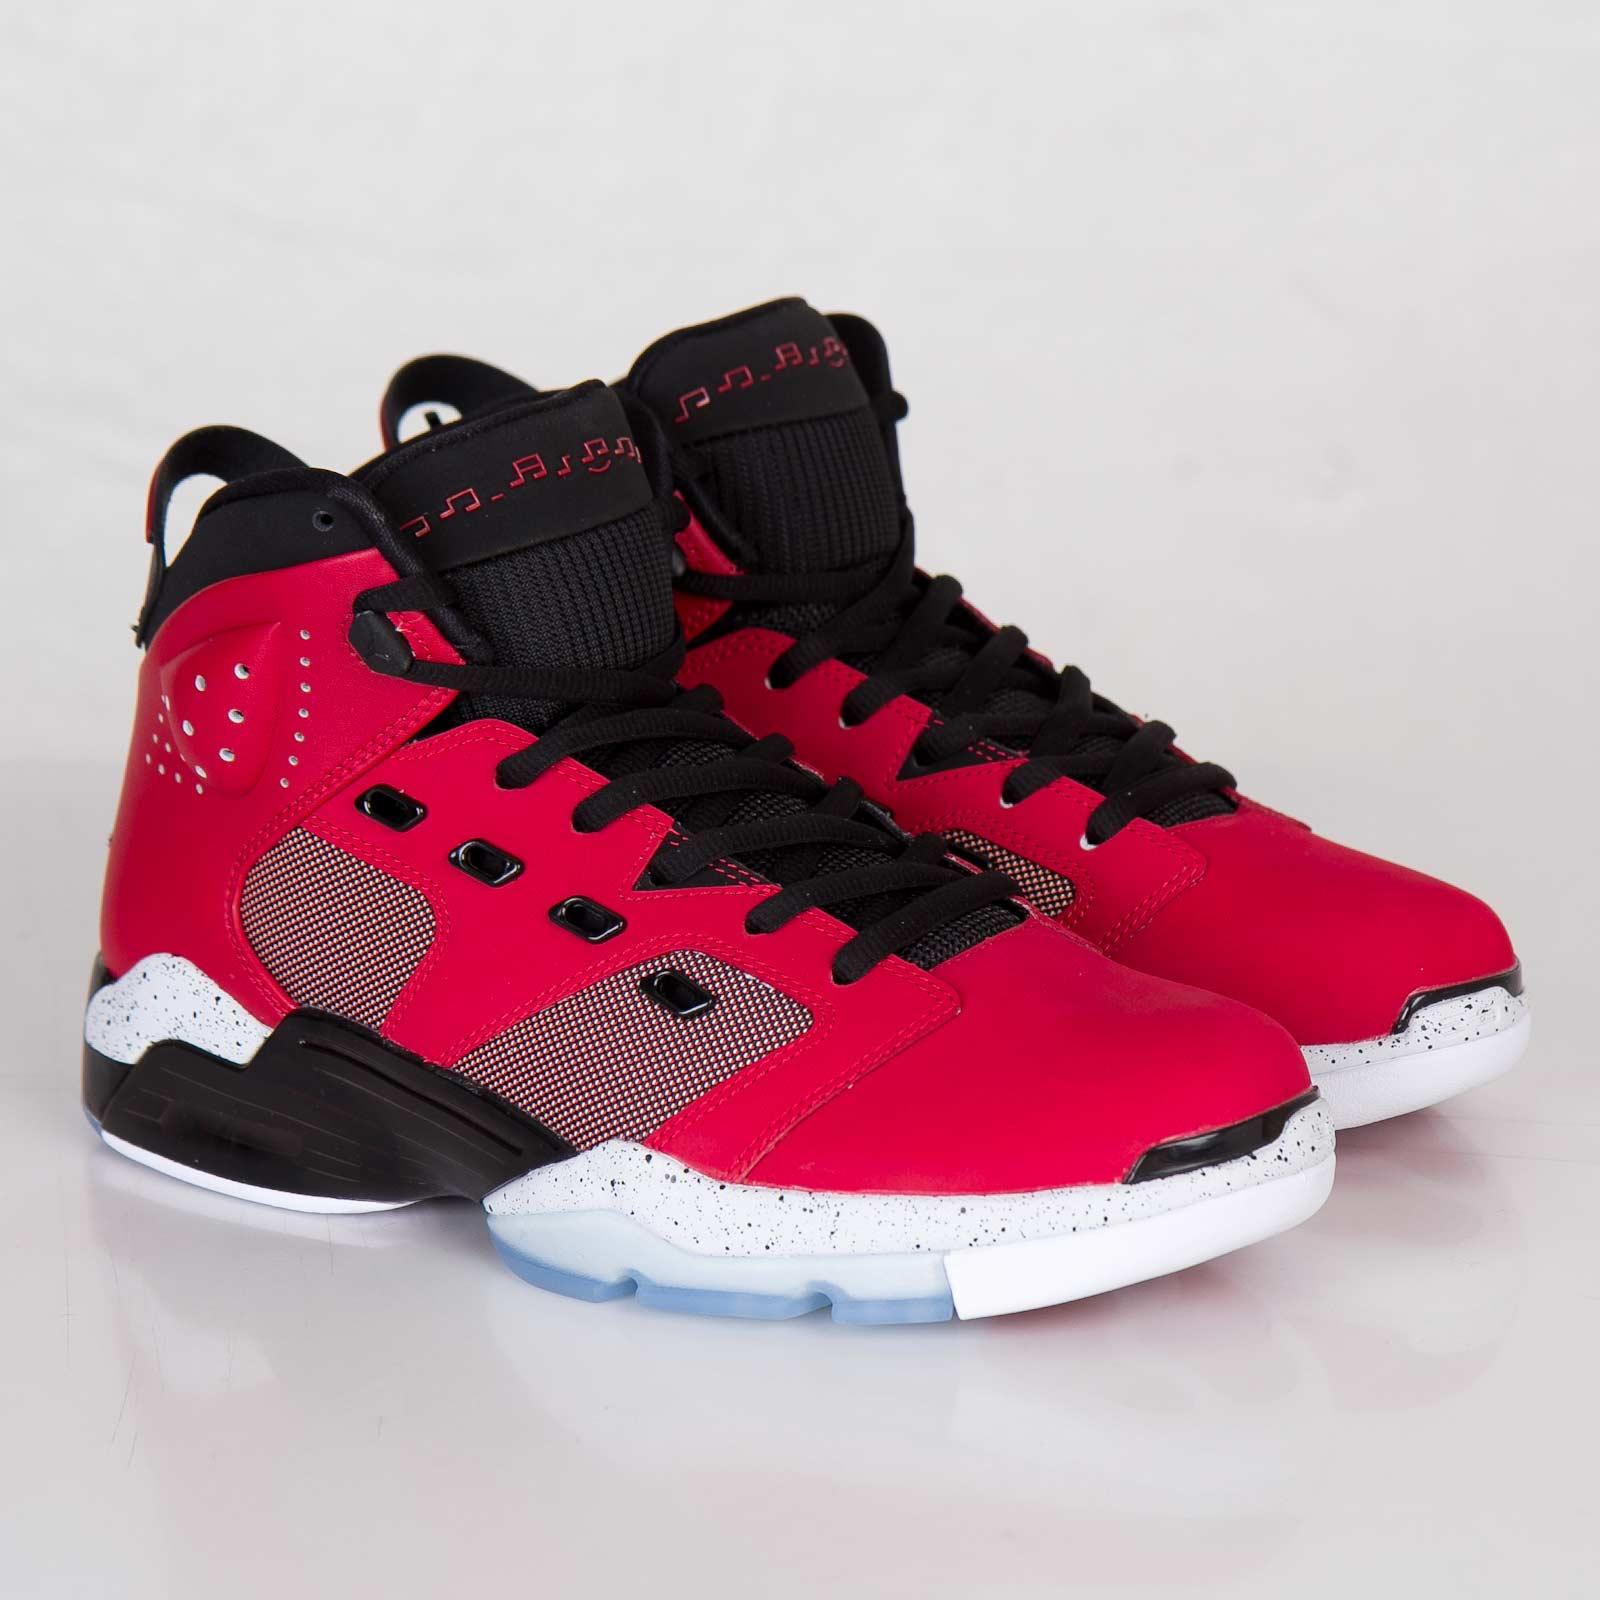 830cdc4cbd2c7a Jordan Brand Jordan 6-17-23 - 428817-601 - Sneakersnstuff